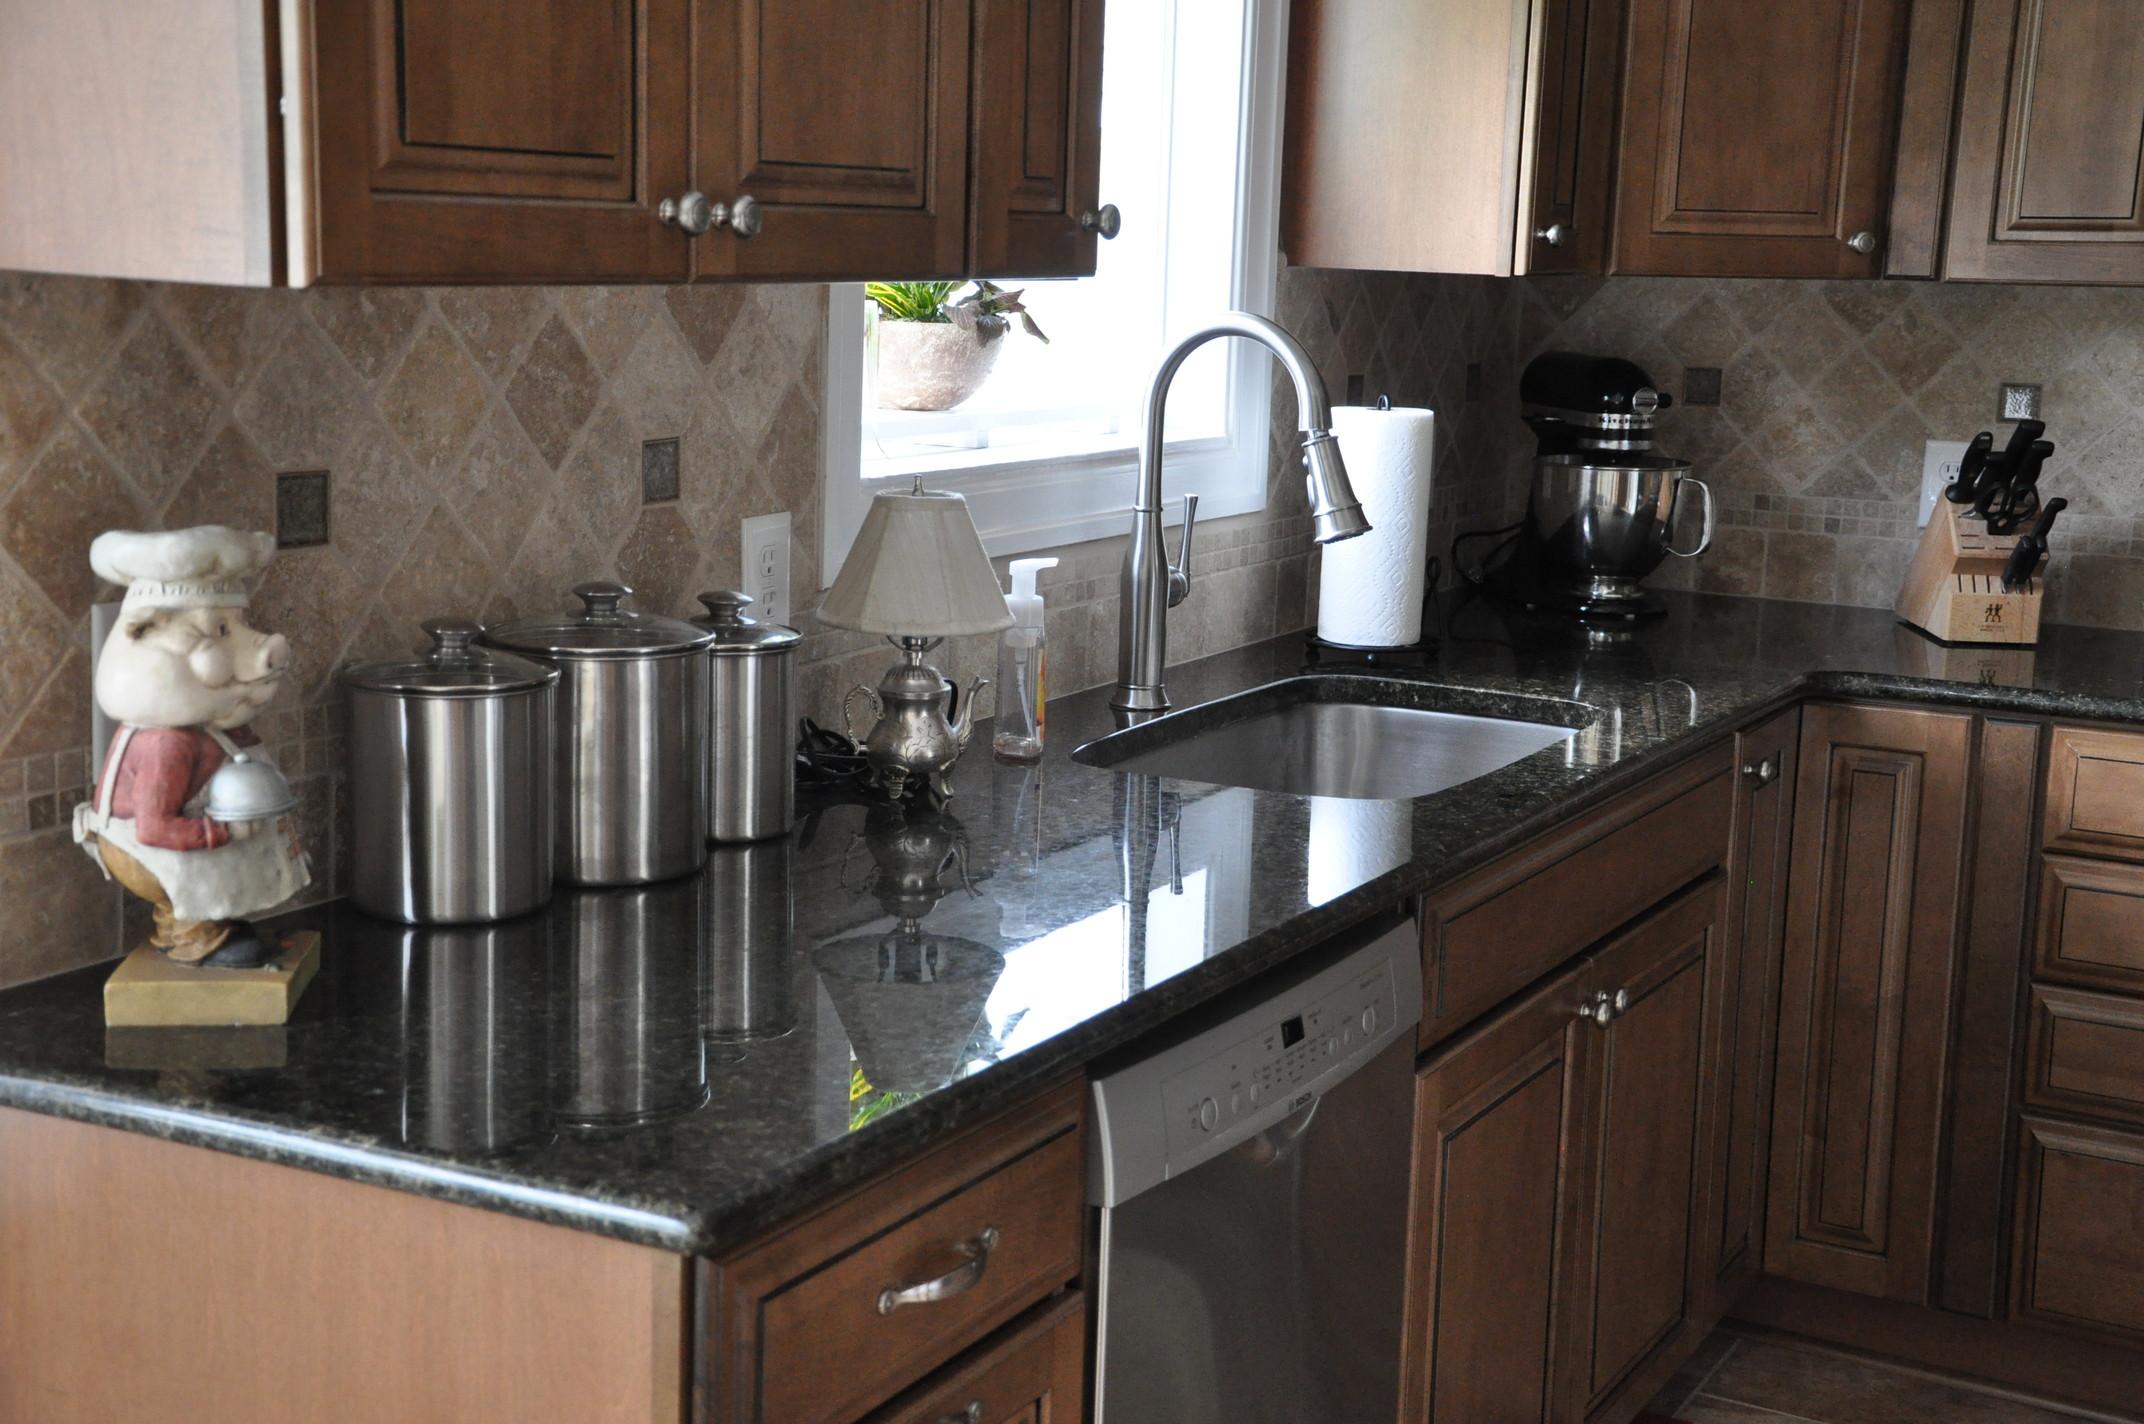 Kitchen Granite Countertops Cityrock Countertops Inc Raleigh Nc Raleigh Nc Uba Tuba